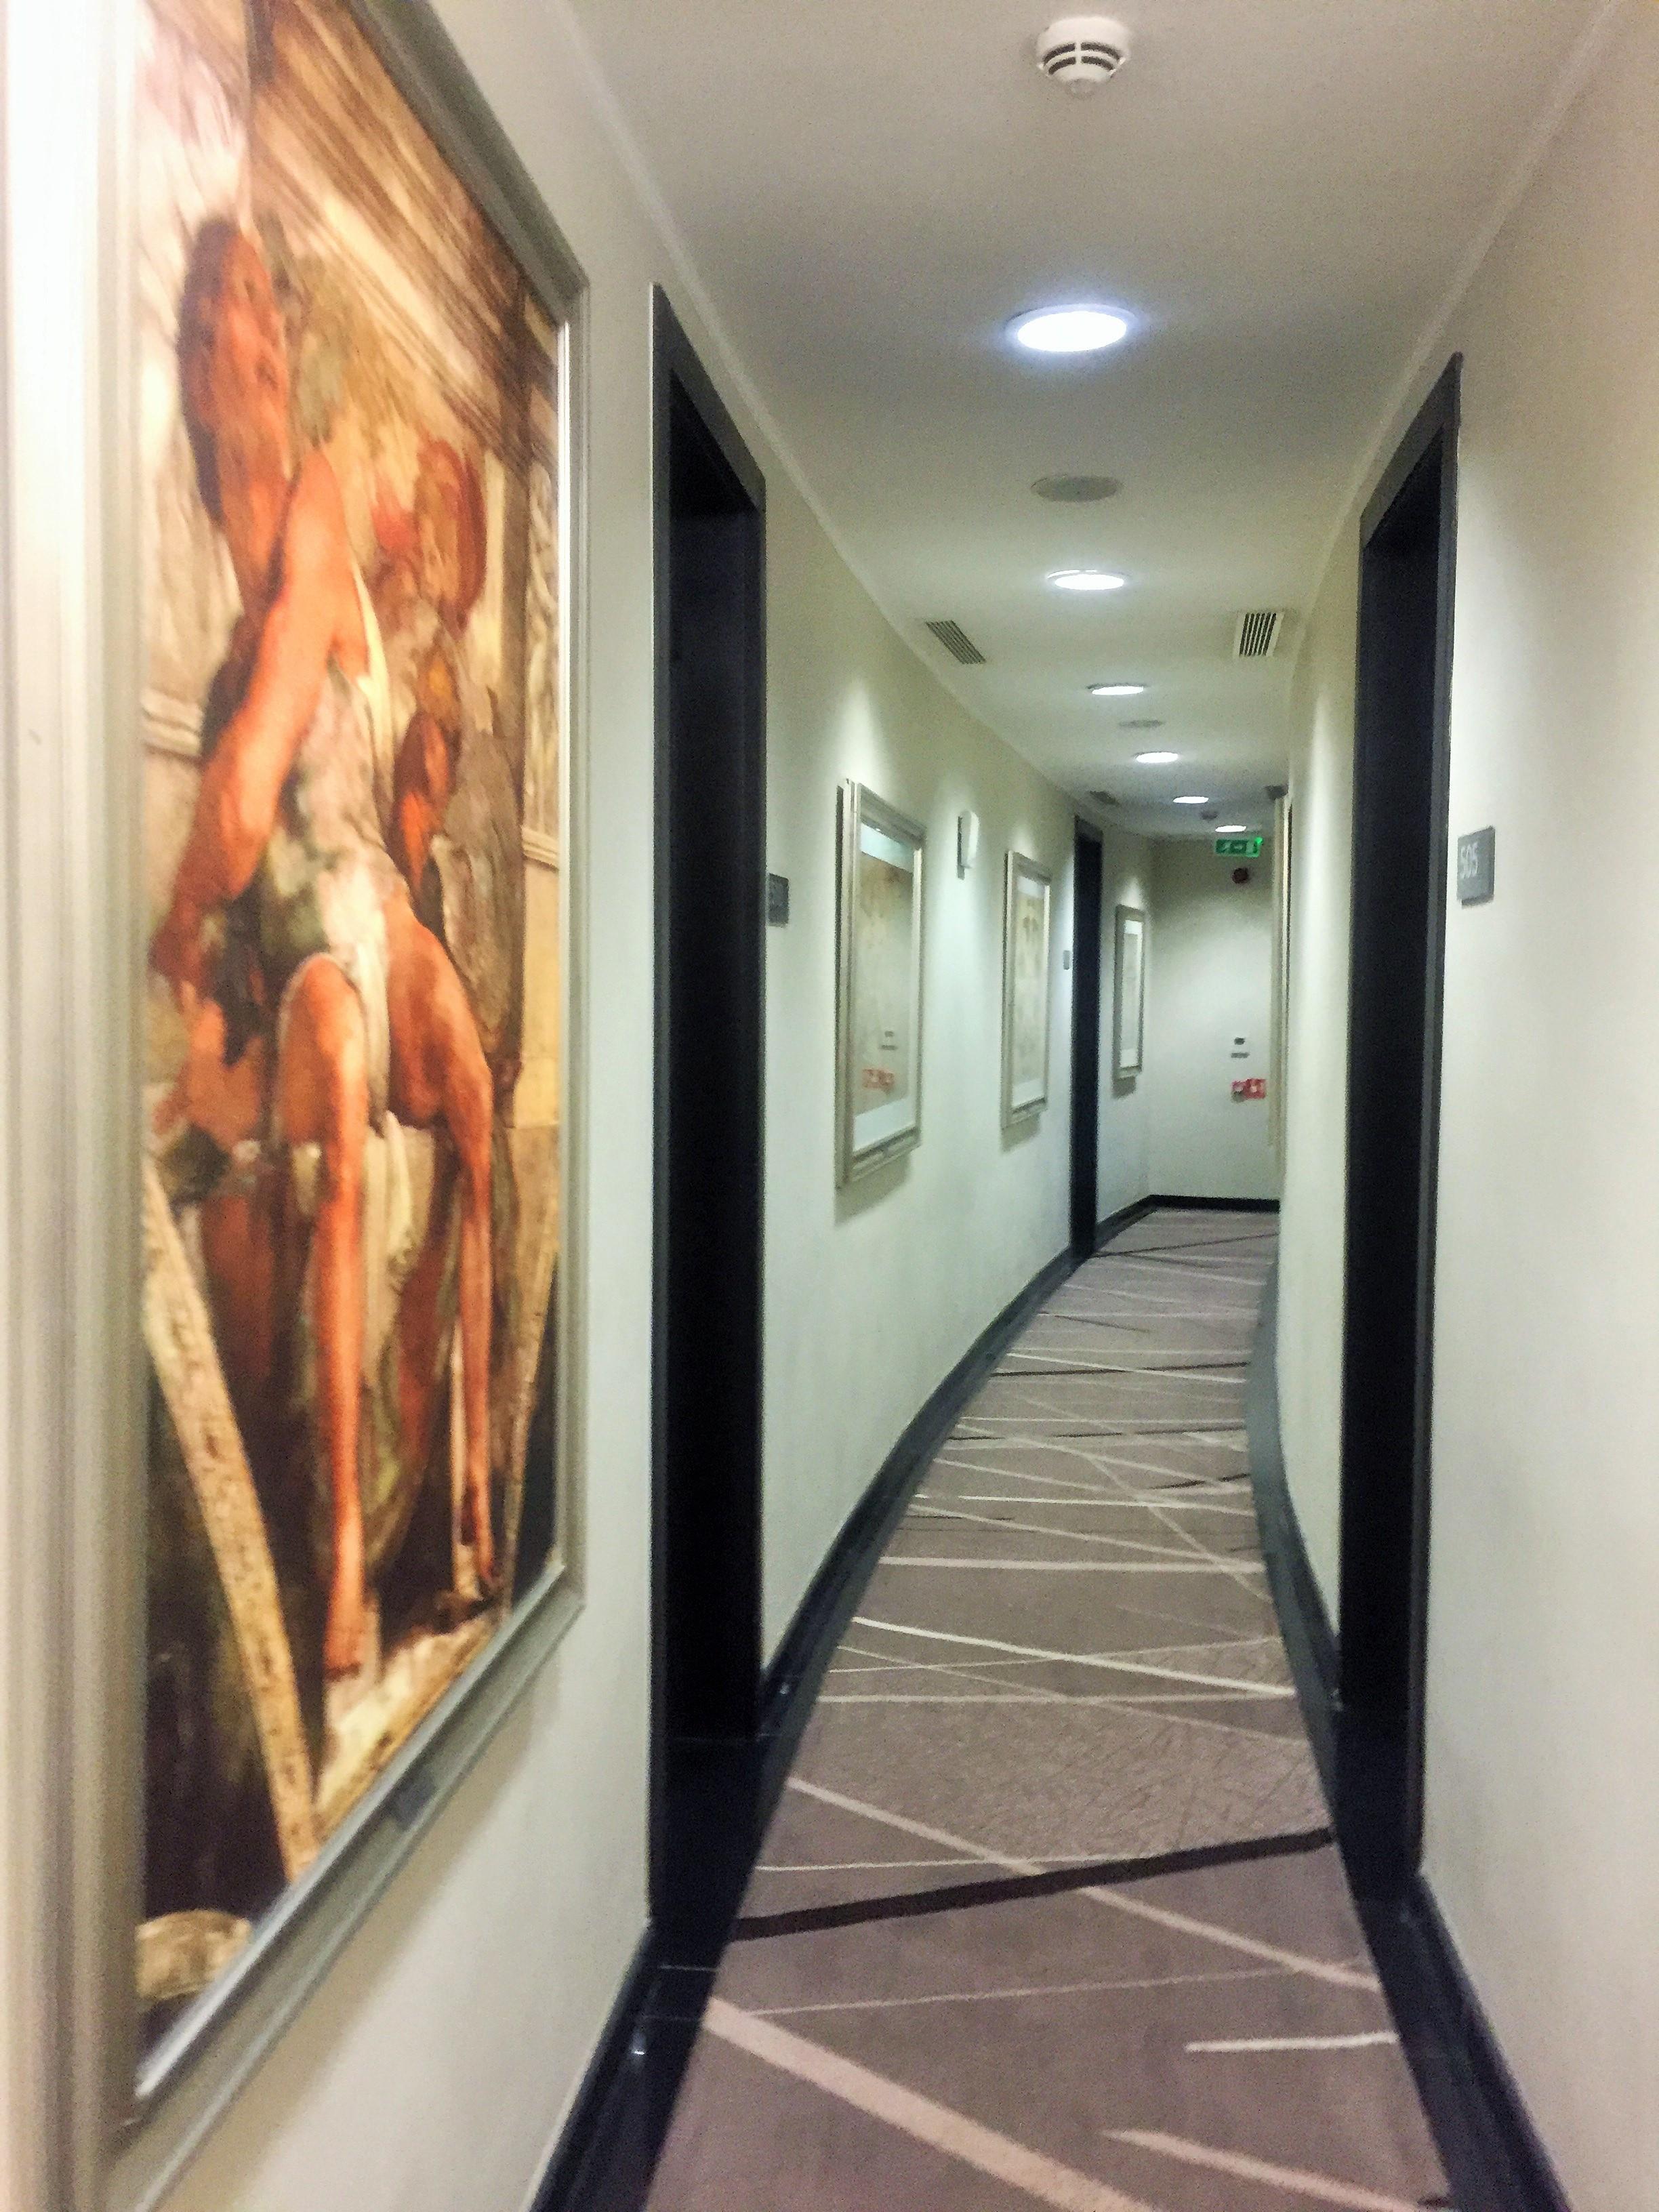 The corridor of the 5th floor